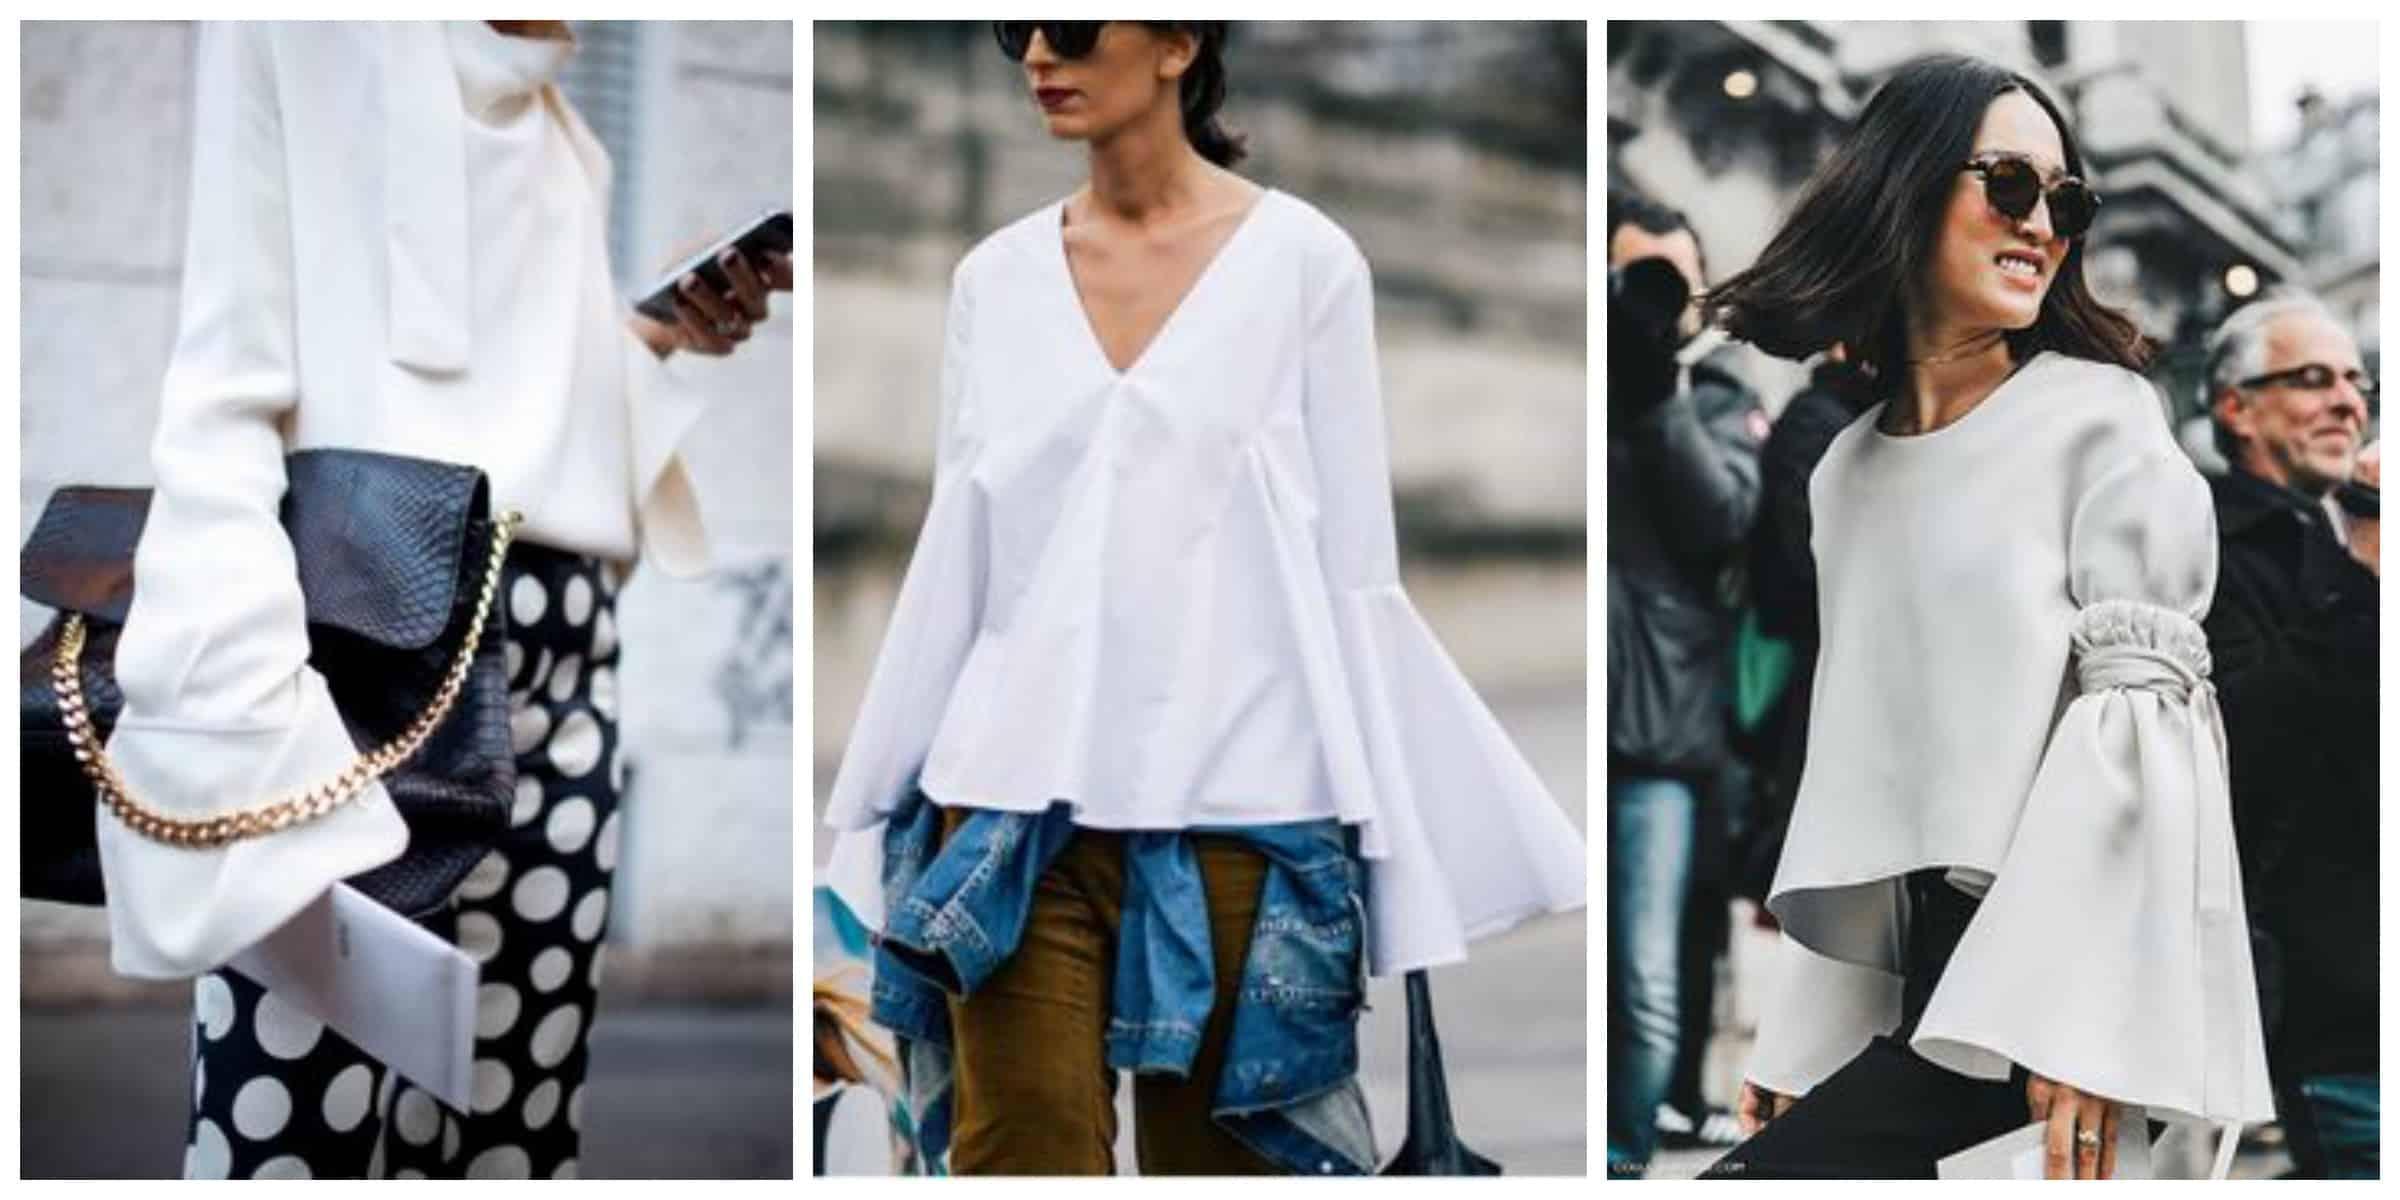 923bfdf9025d53 2016 Trend Alert: BIG Sleeves – The Fashion Tag Blog